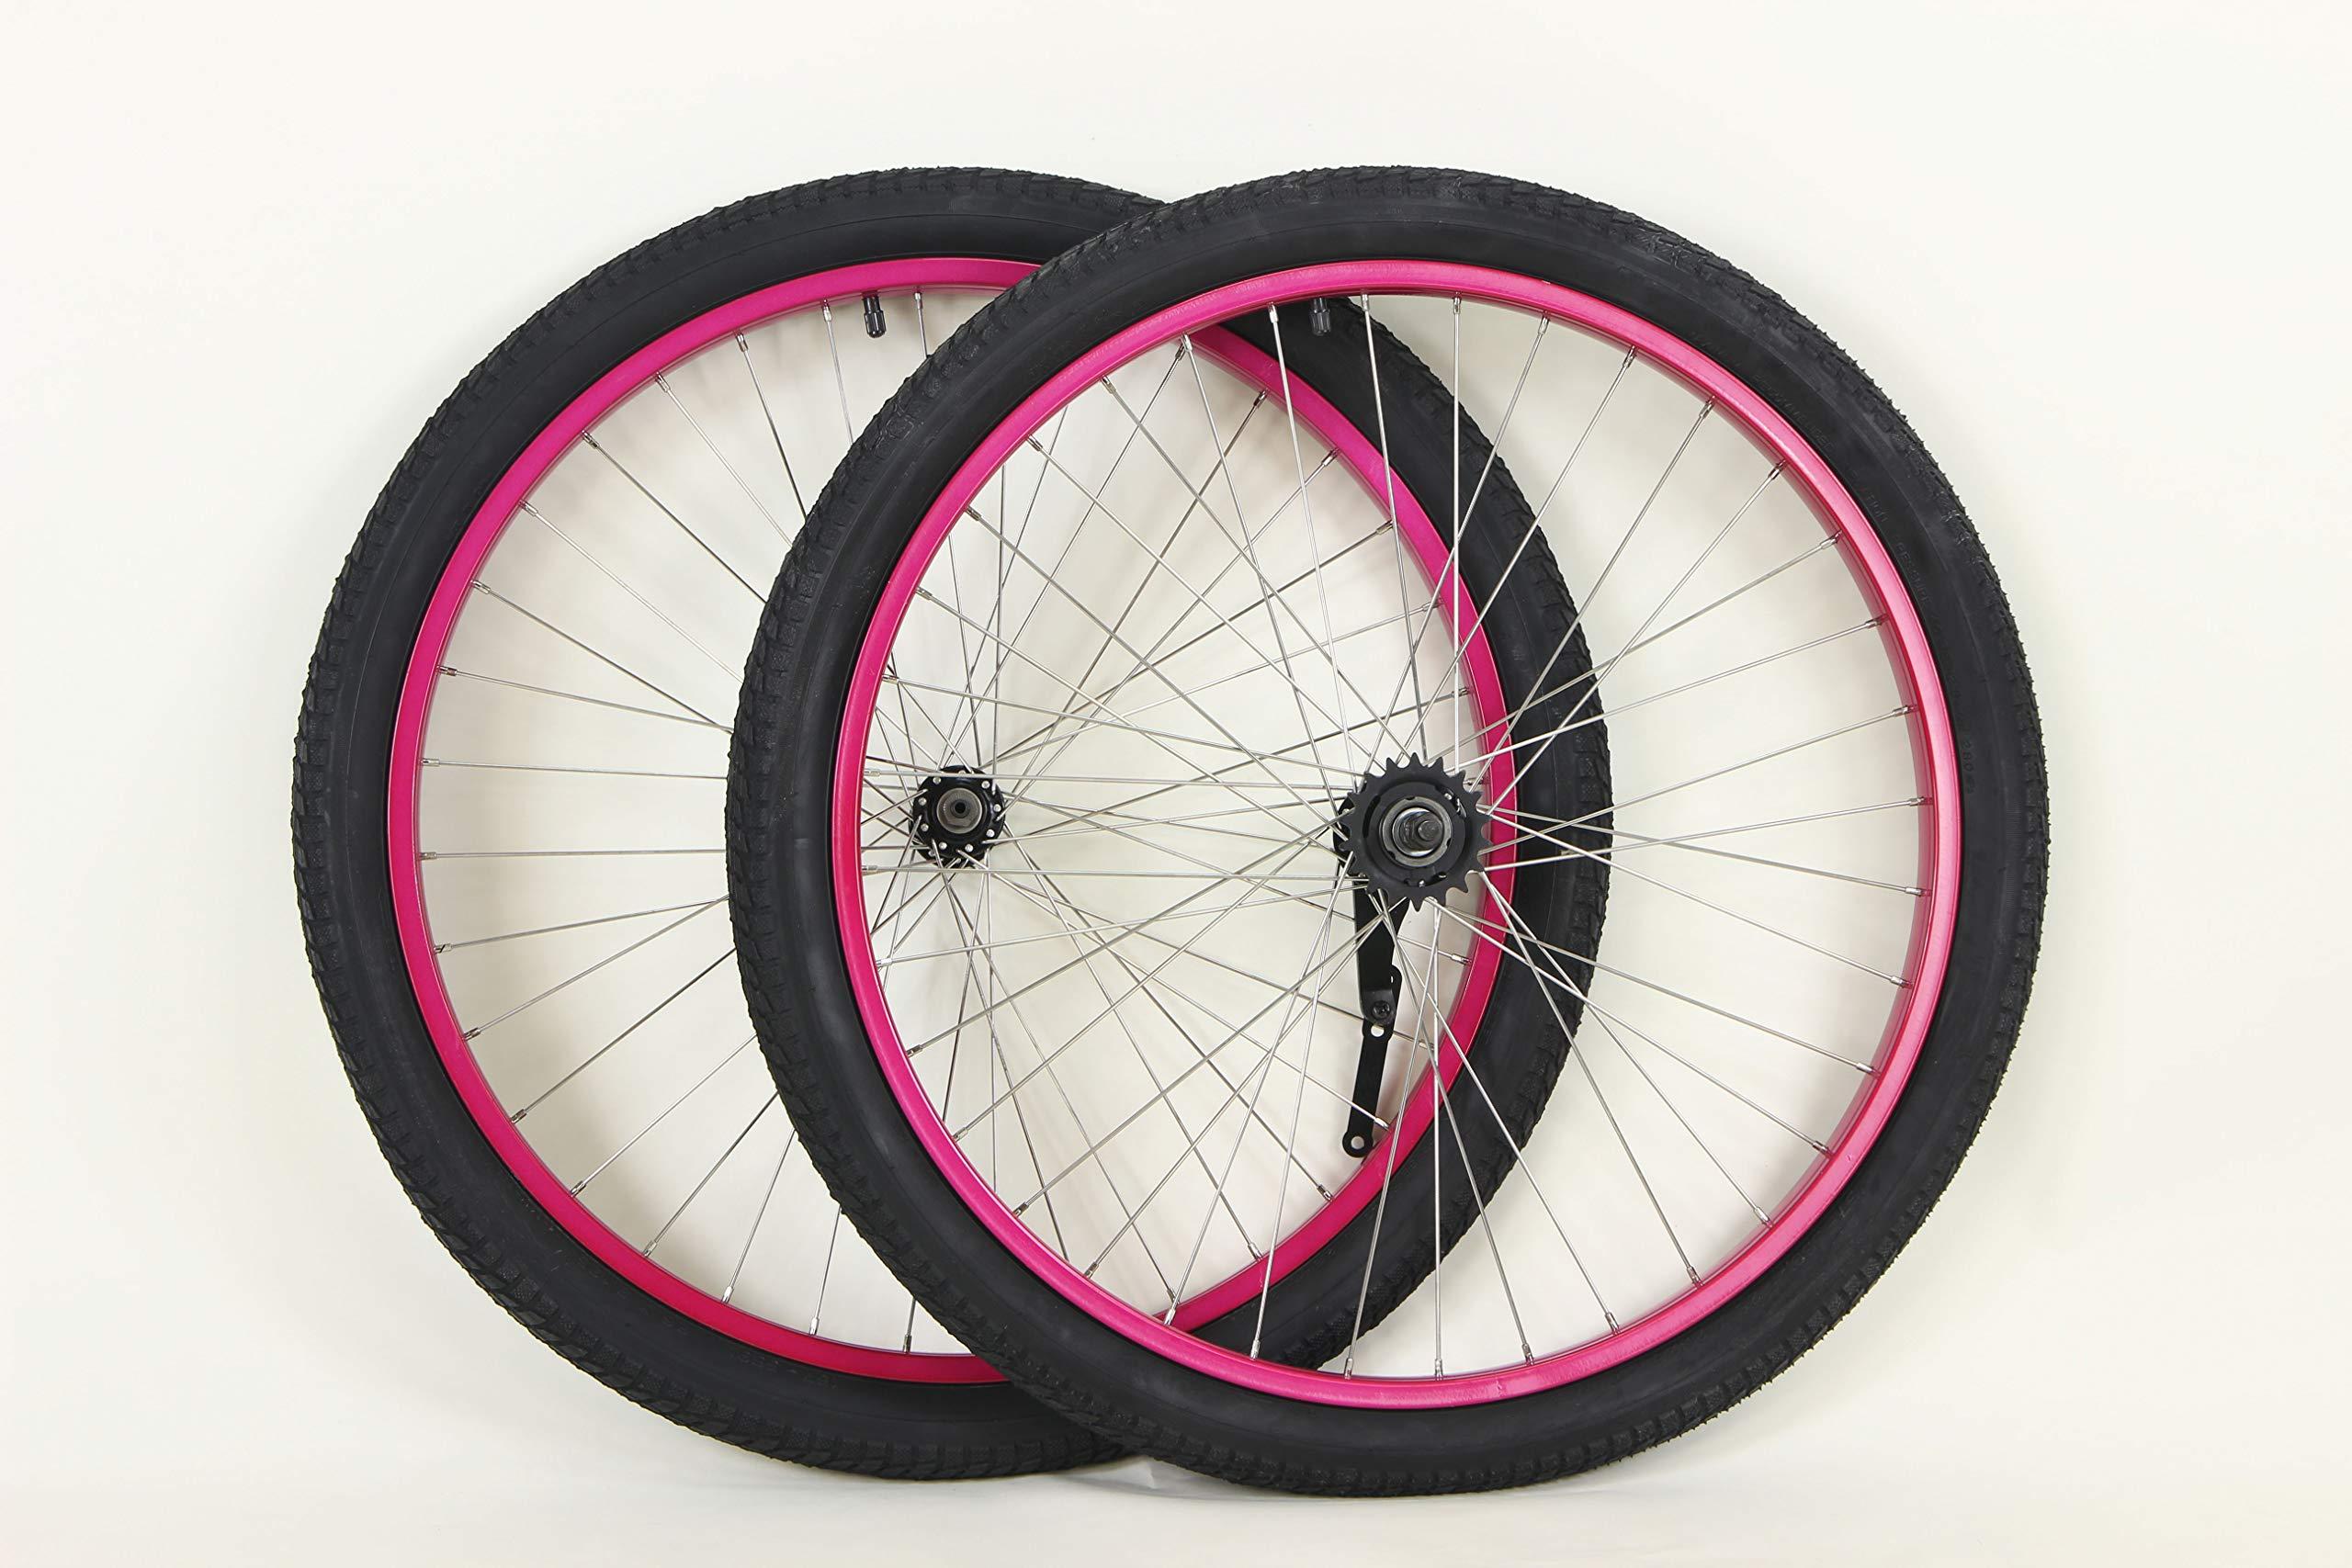 MANGO 26 inch Coaster Brake Wheel Set Beach Cruiser Bike Bicycle with Tires and Tubes! (Black) (Pink)